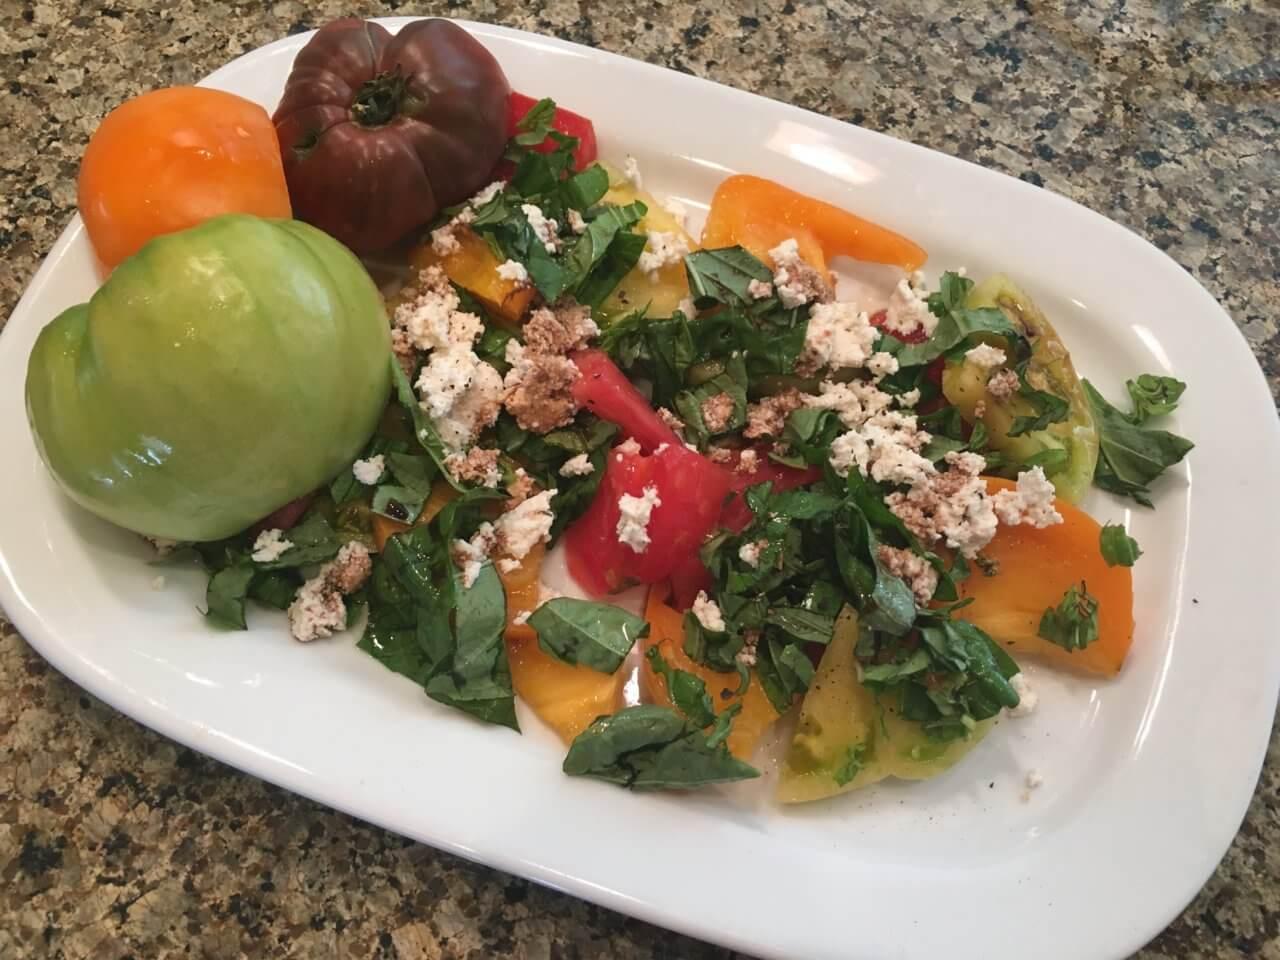 Vegan-Caprese-Salad-1280x960.jpg